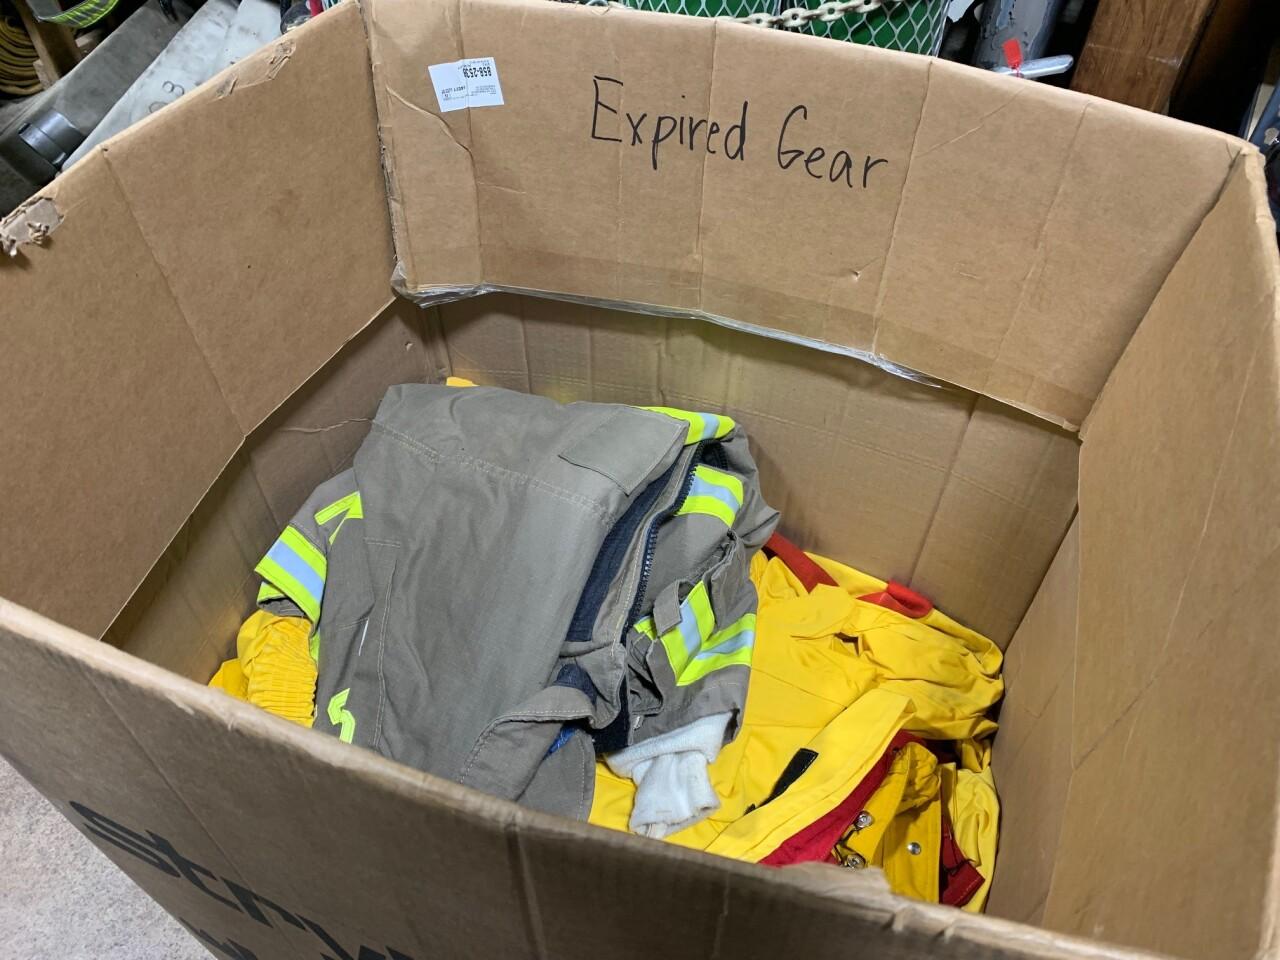 firefighter donations 2.jpg